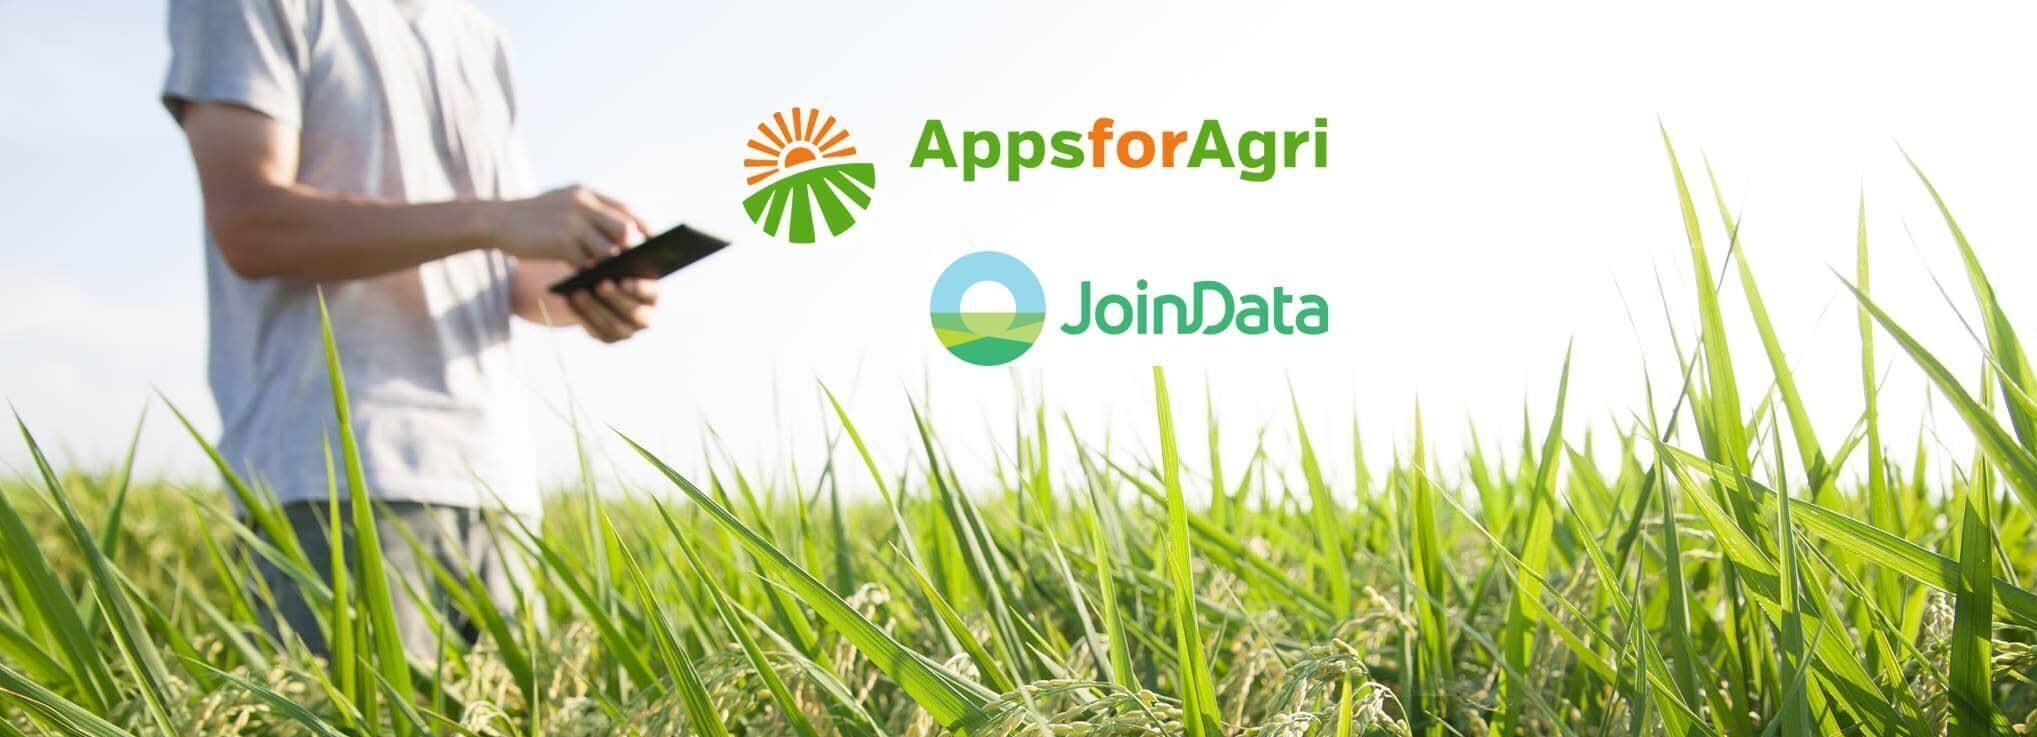 AppsforAgri en JoinData